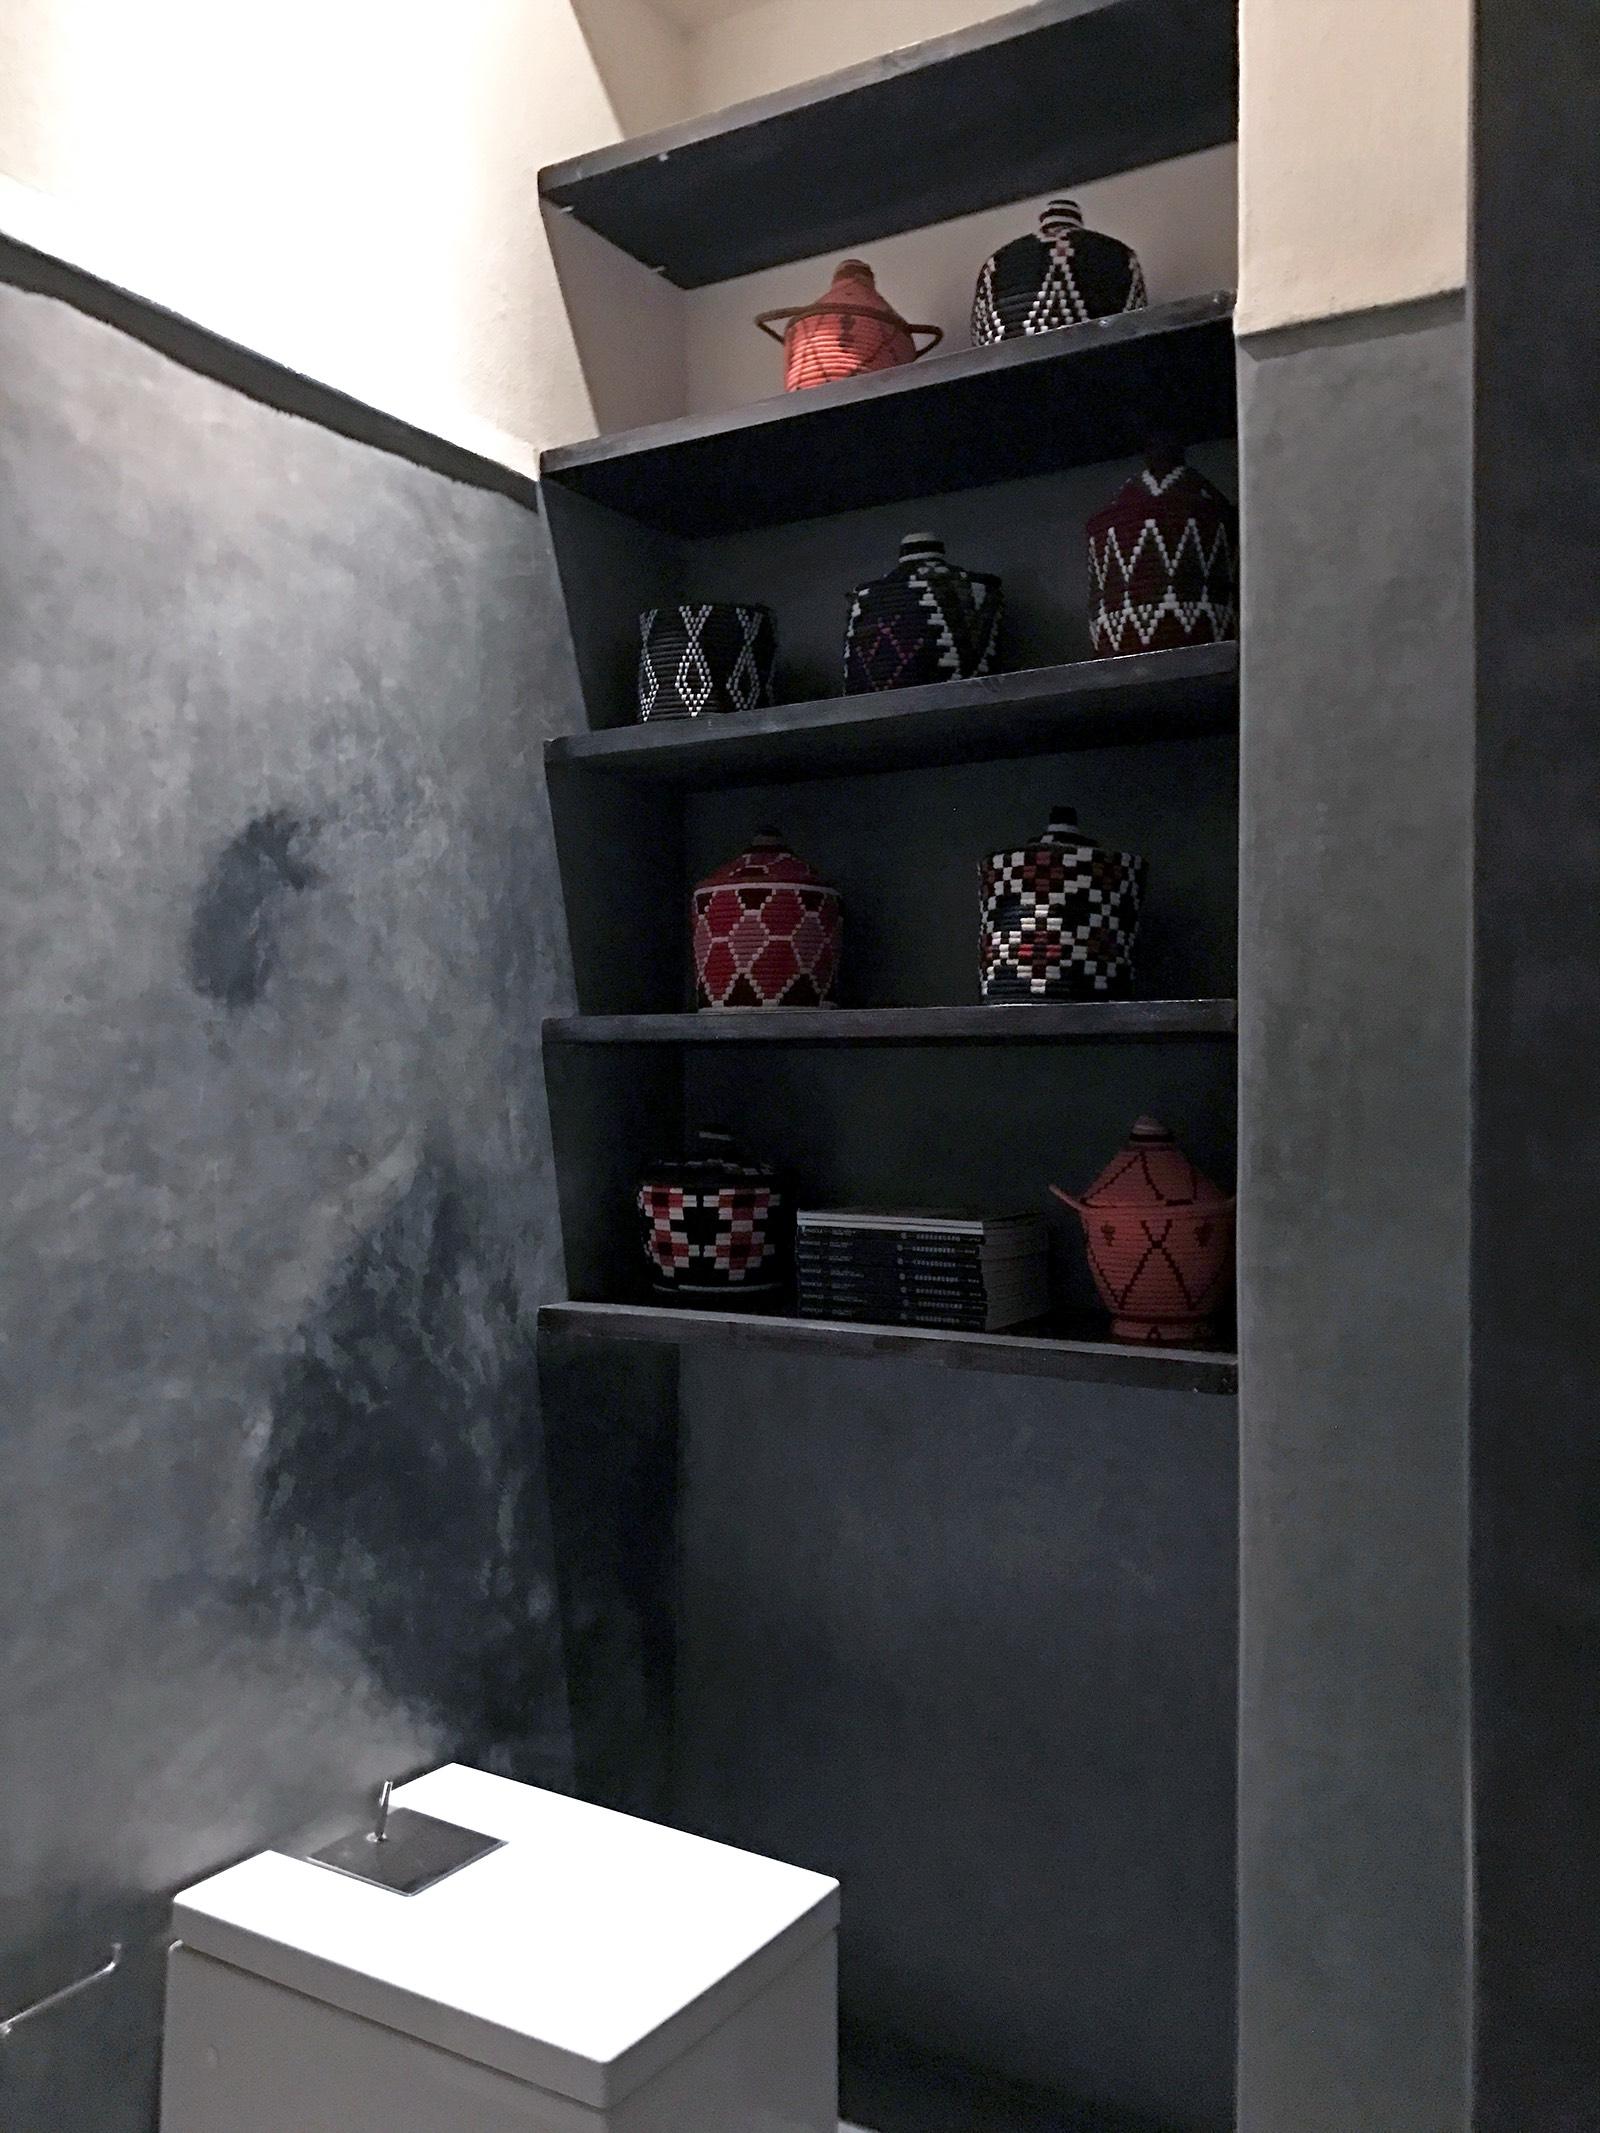 Marrakesh-Riad-Be-Mena-baskets-modern-bathroom.jpg